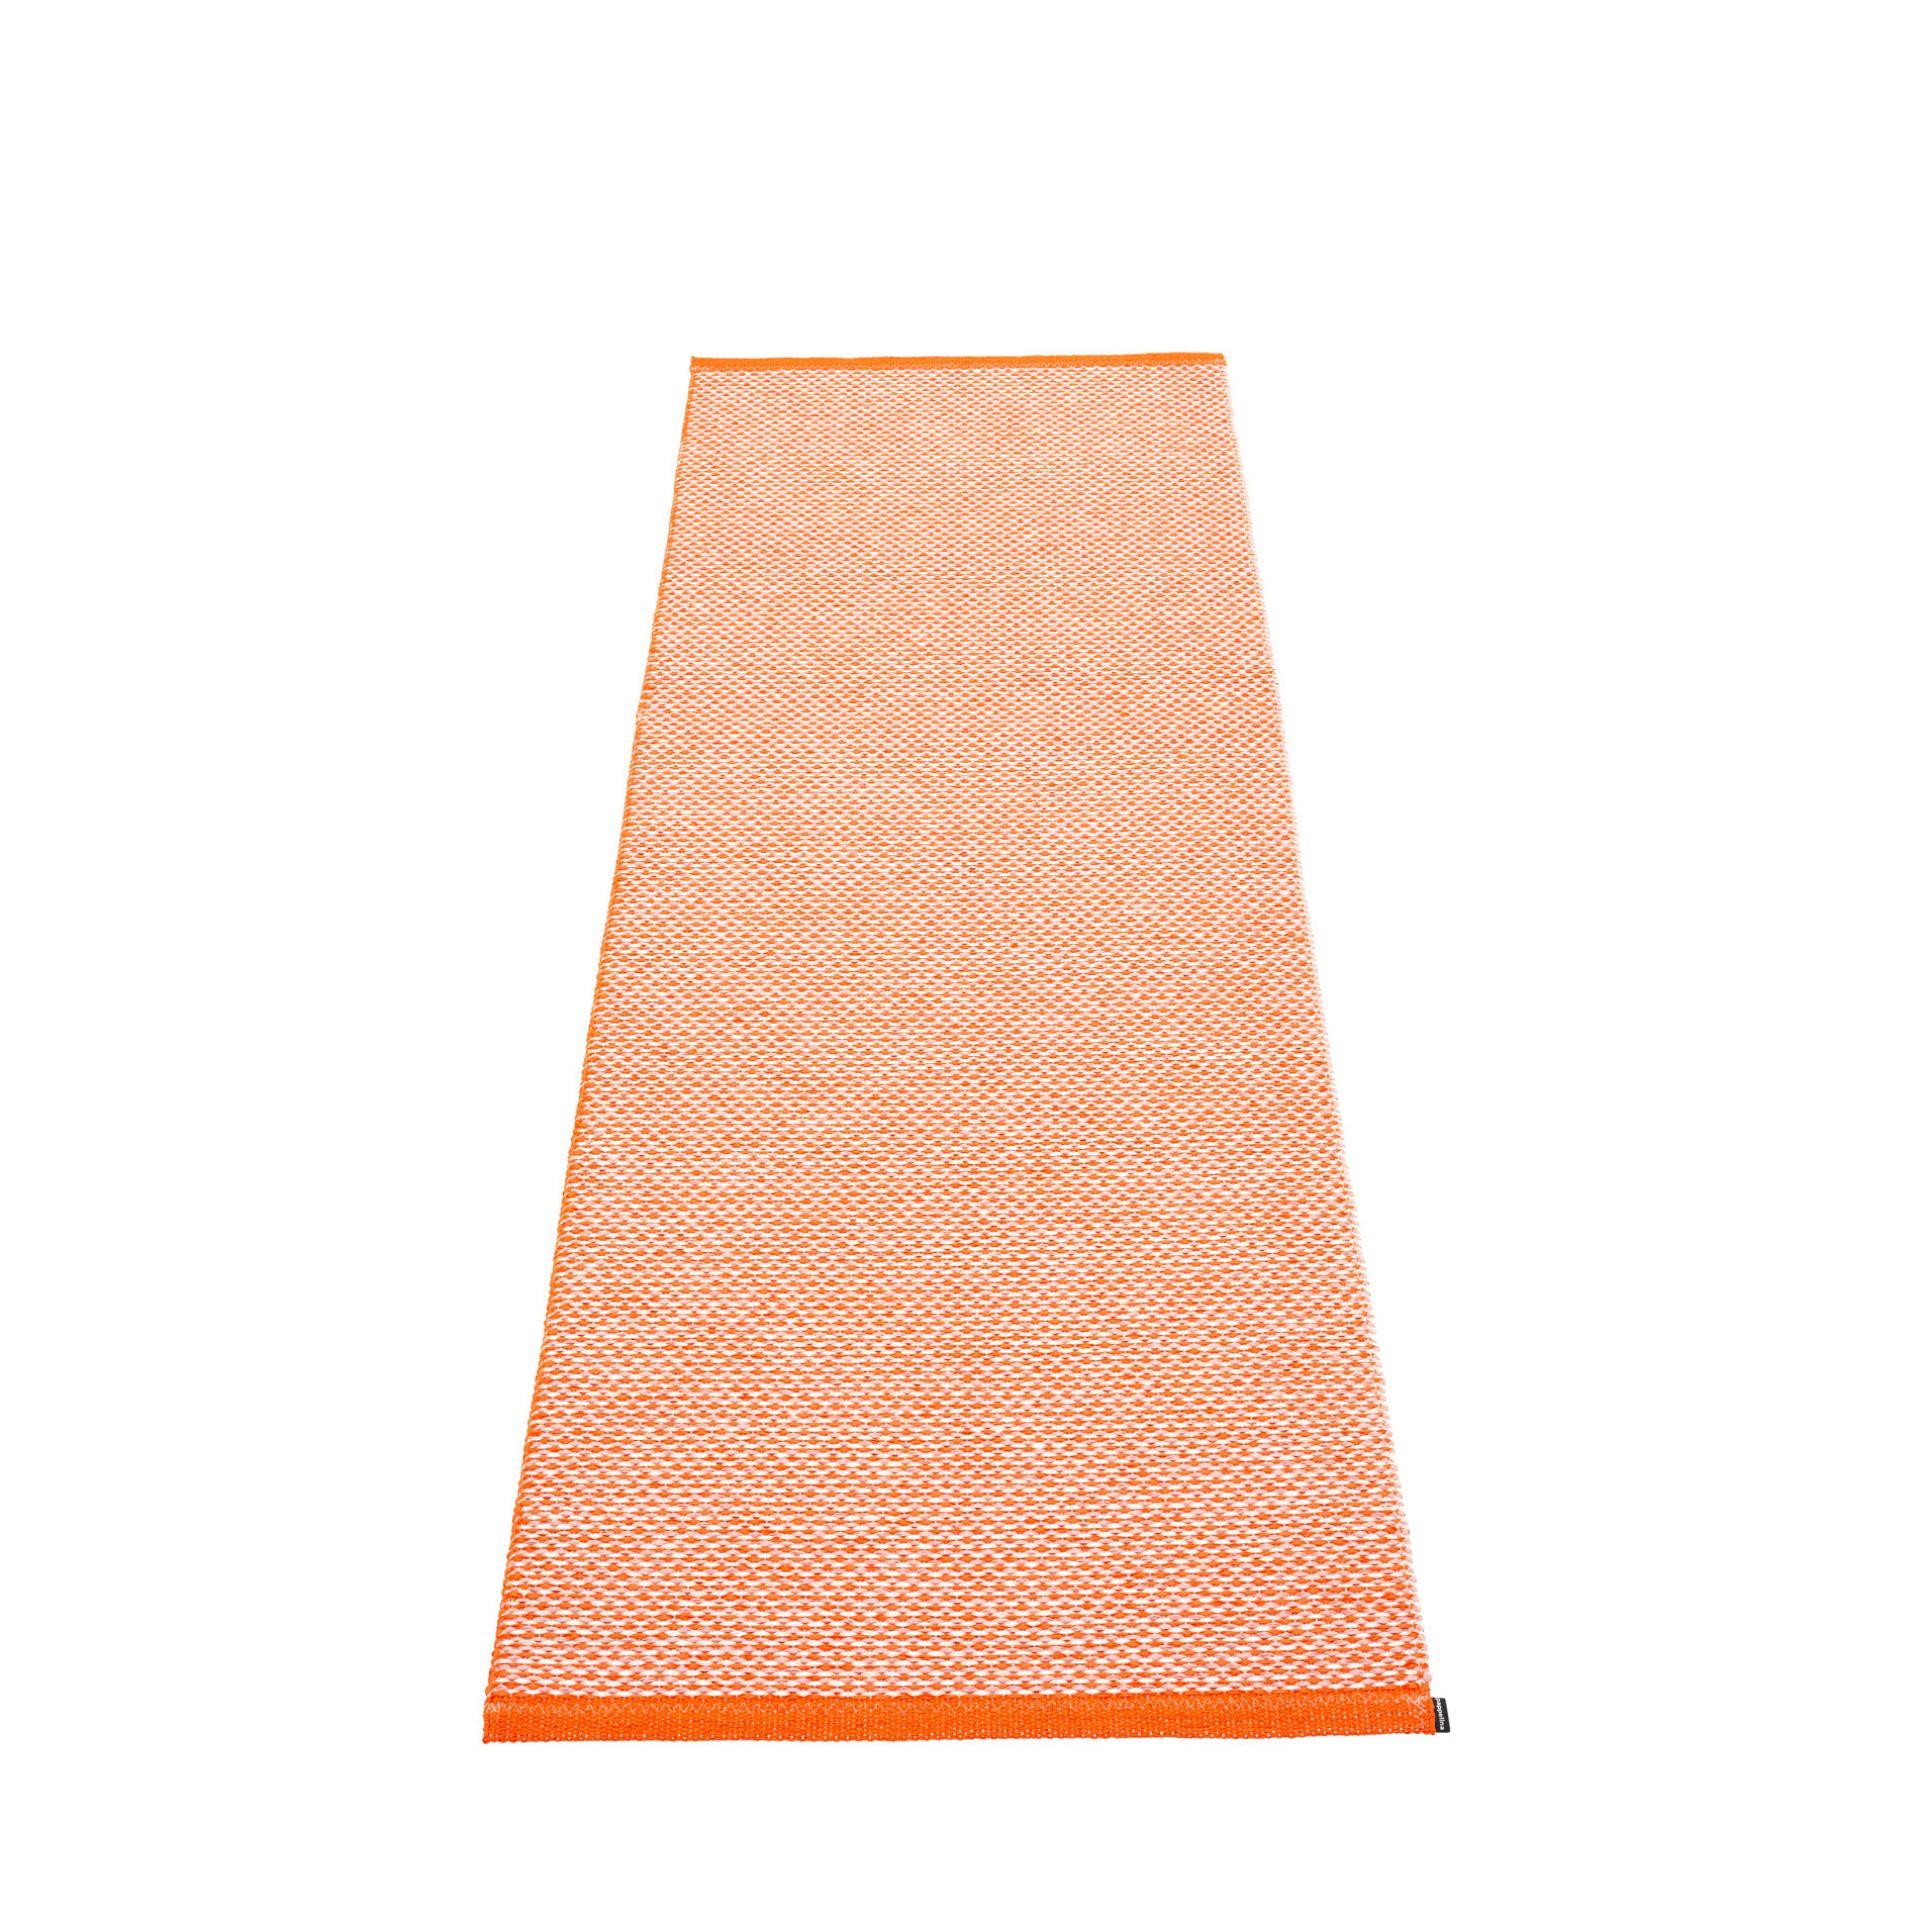 Effi Kunststoffteppich 70x200 cm Pappelina Orange